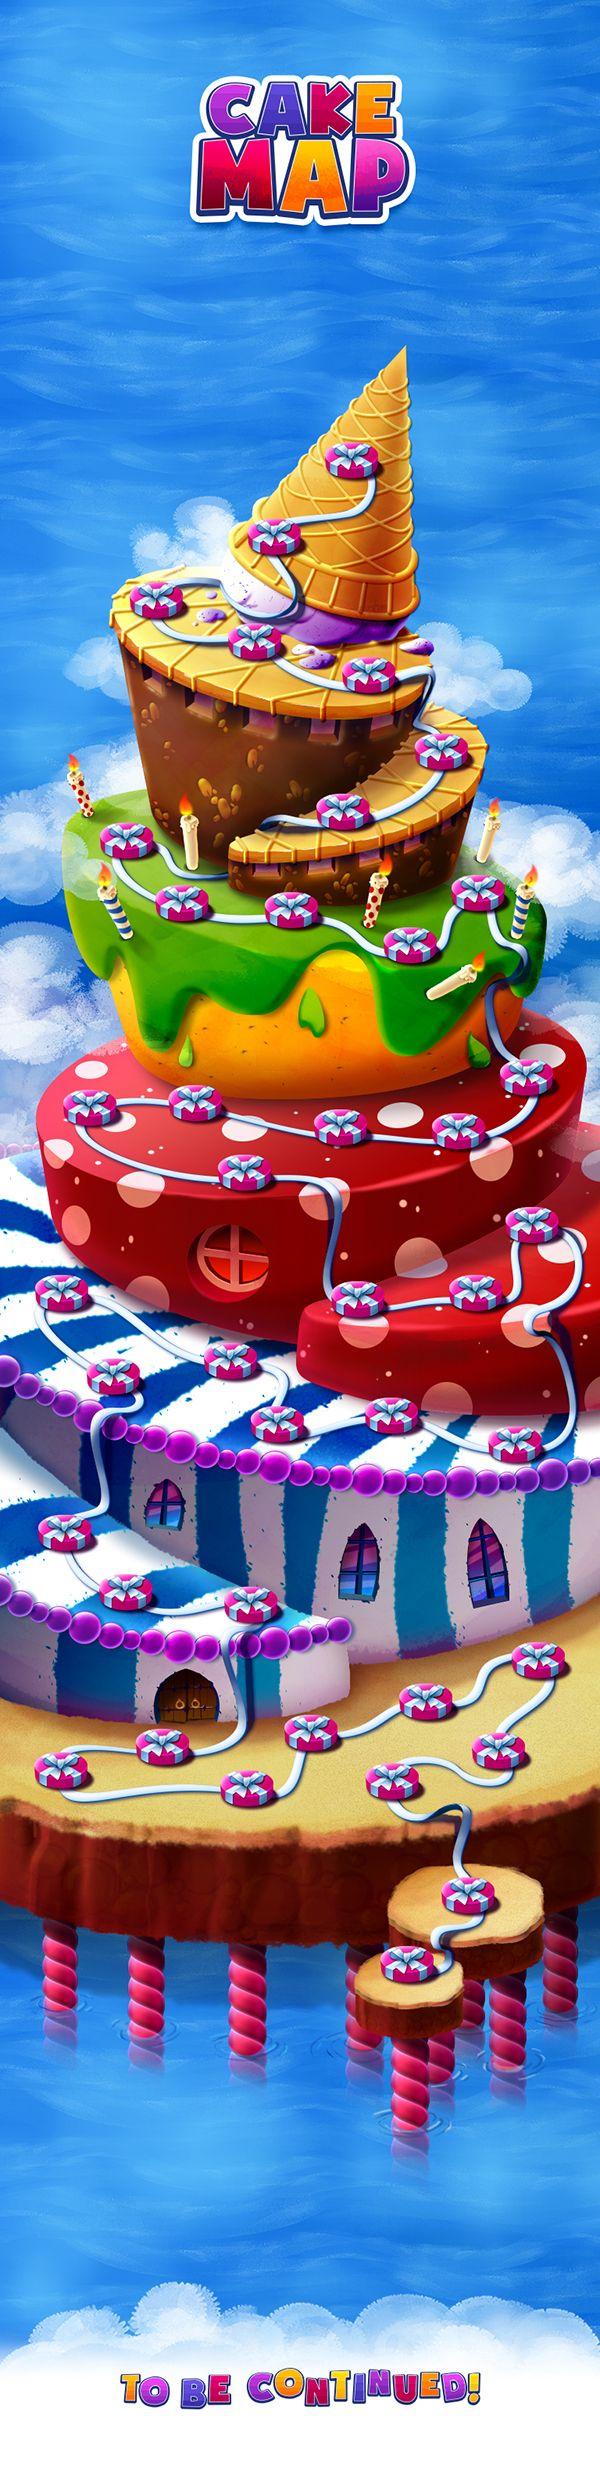 CAKE MAP on Behance